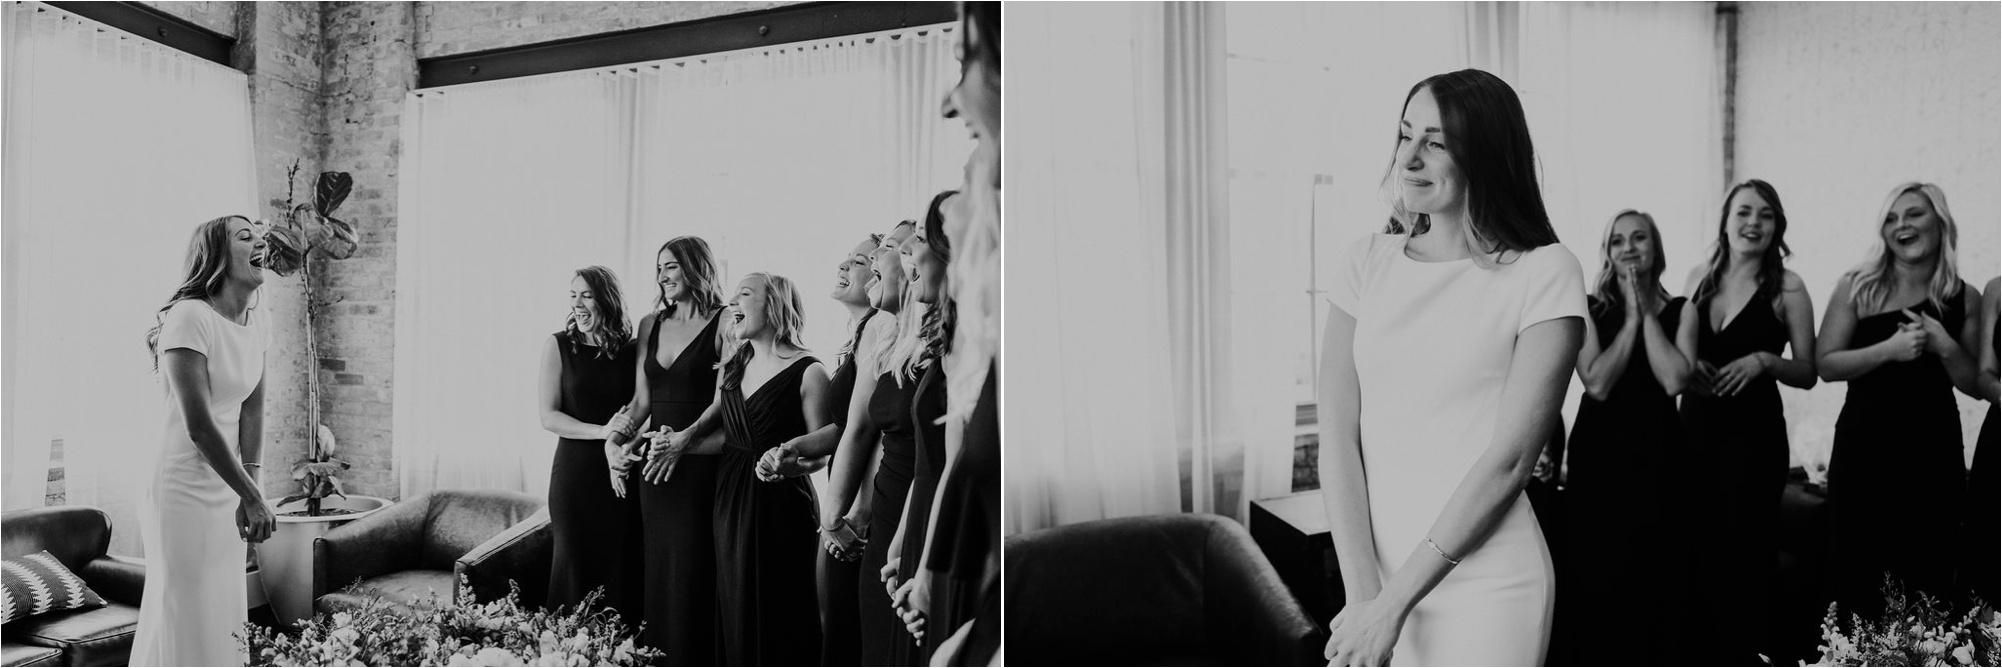 Machine Shop Minneapolis Wedding Photographer_3539.jpg